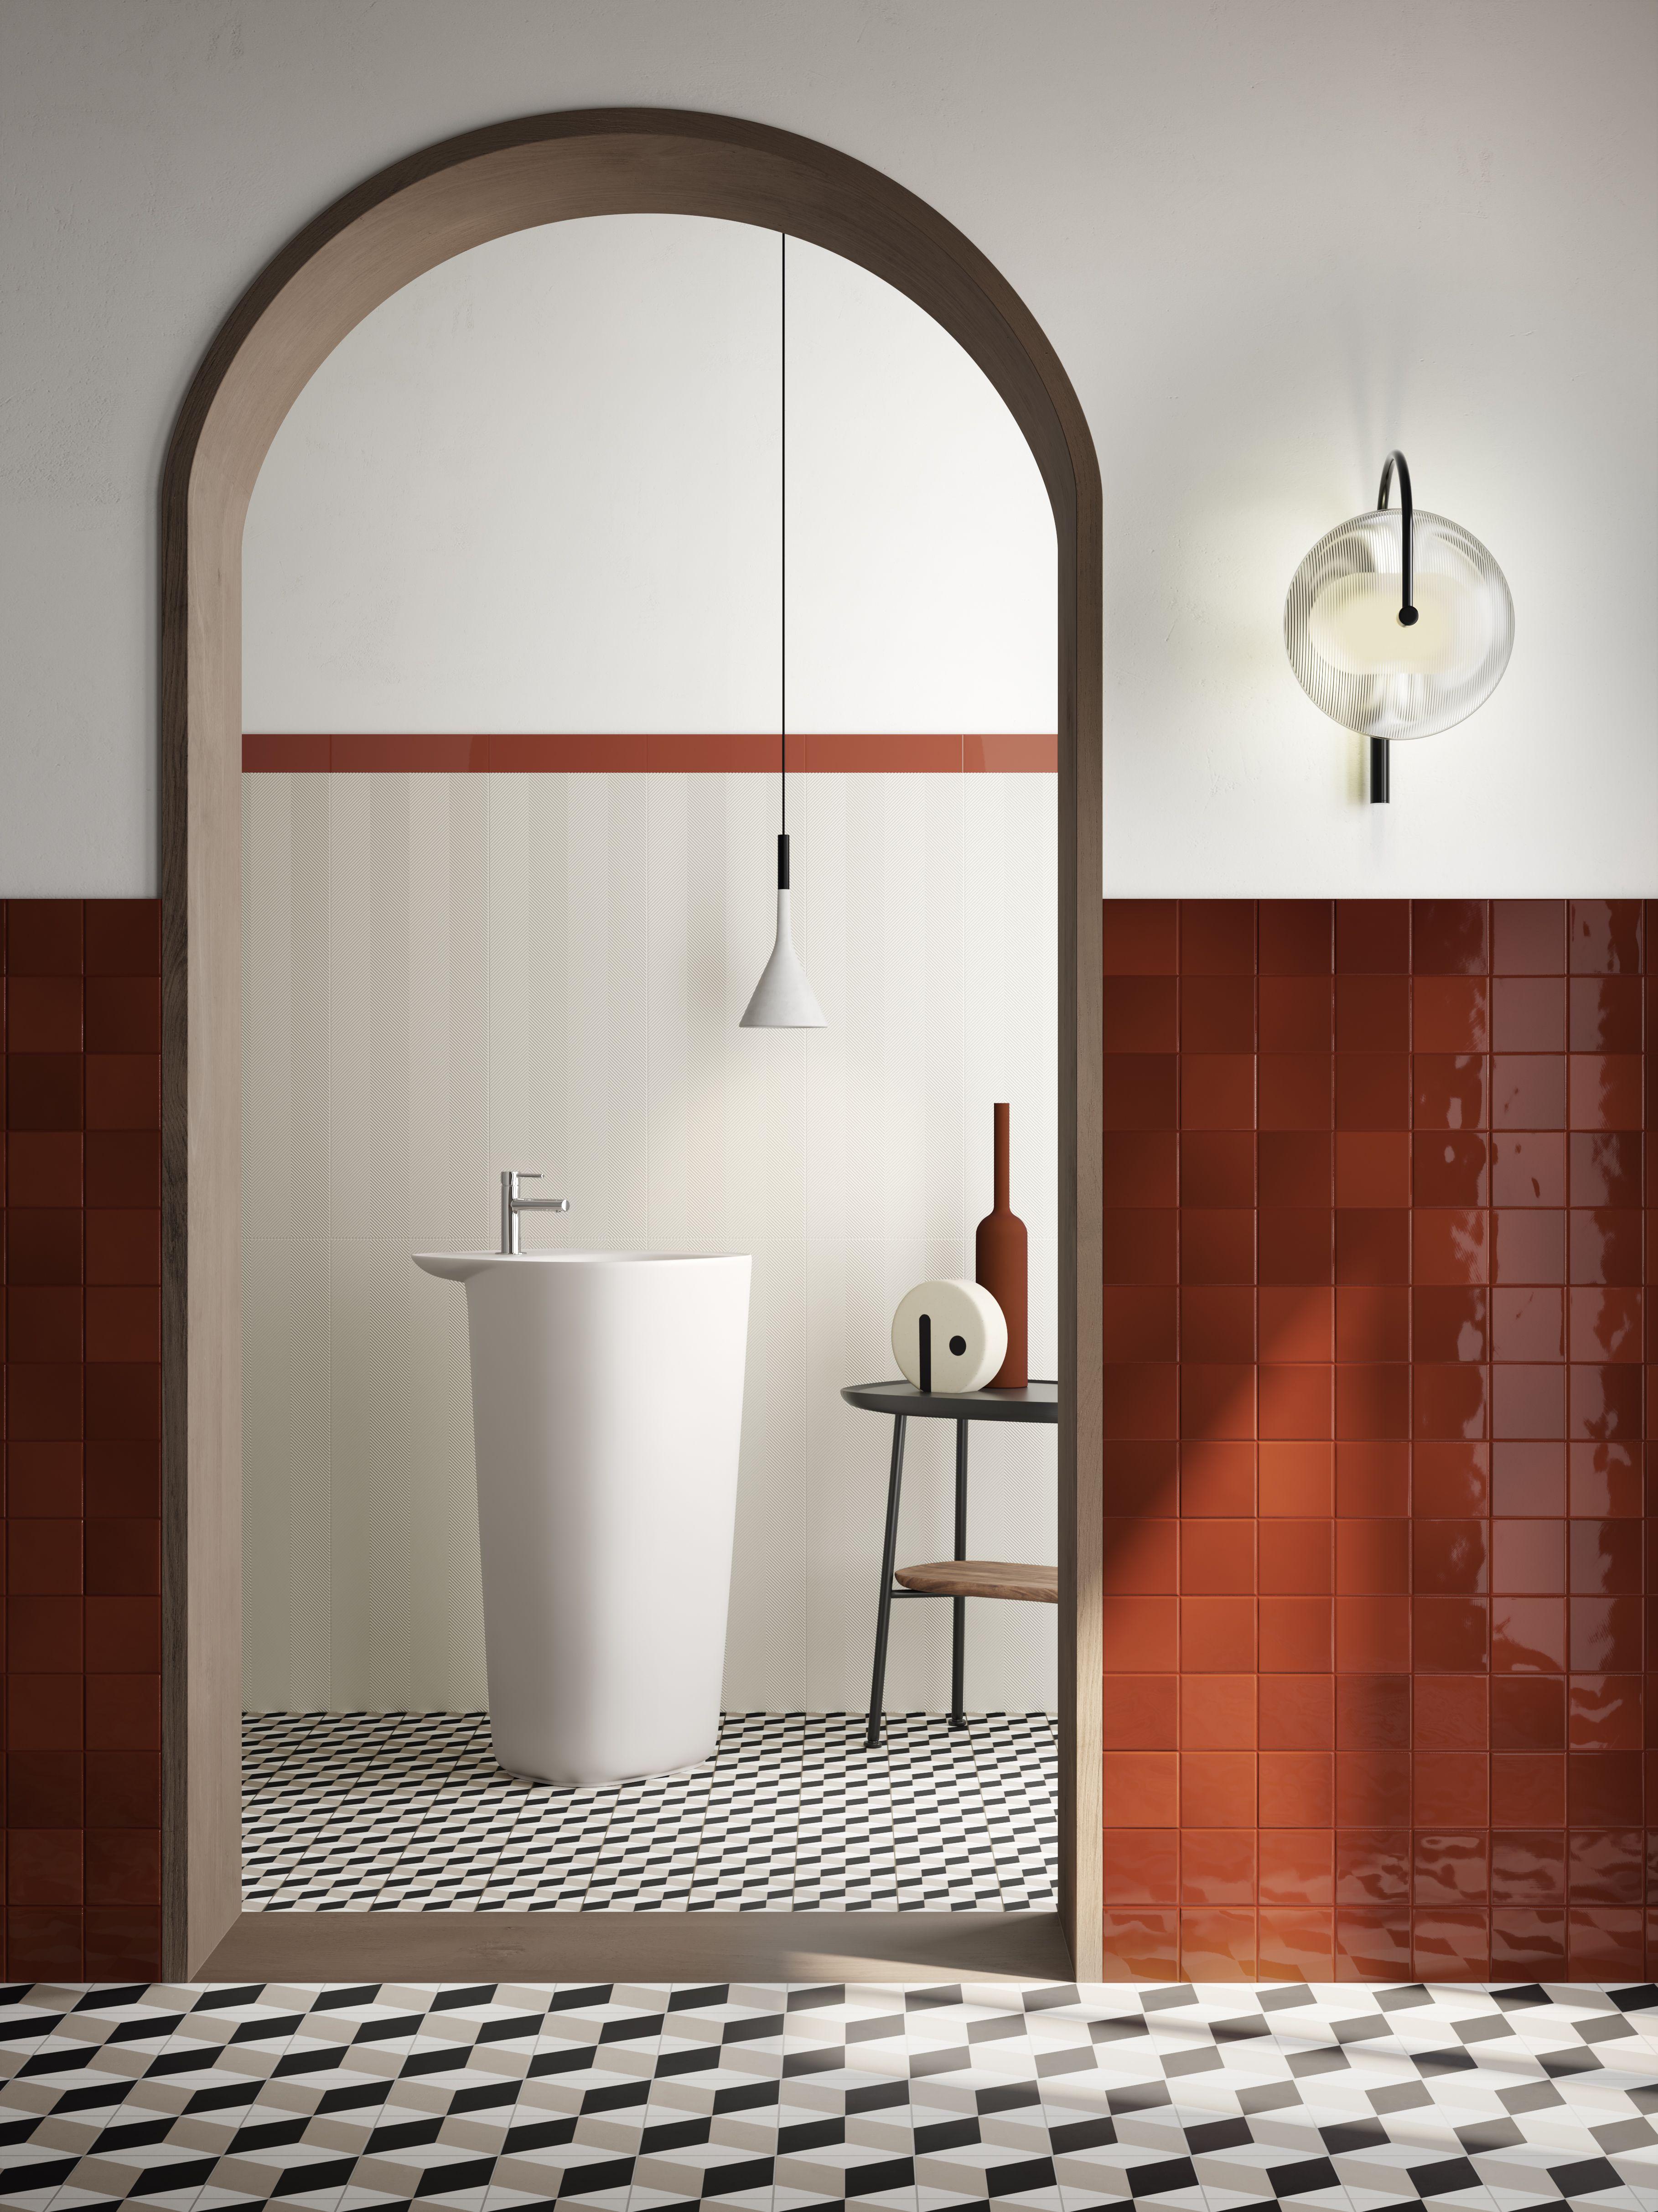 salle de bain carrelage porte orange rouge terracotta blanc noir carreau ciment sol mur idee salle de bain idee decoration appartement salle de bain